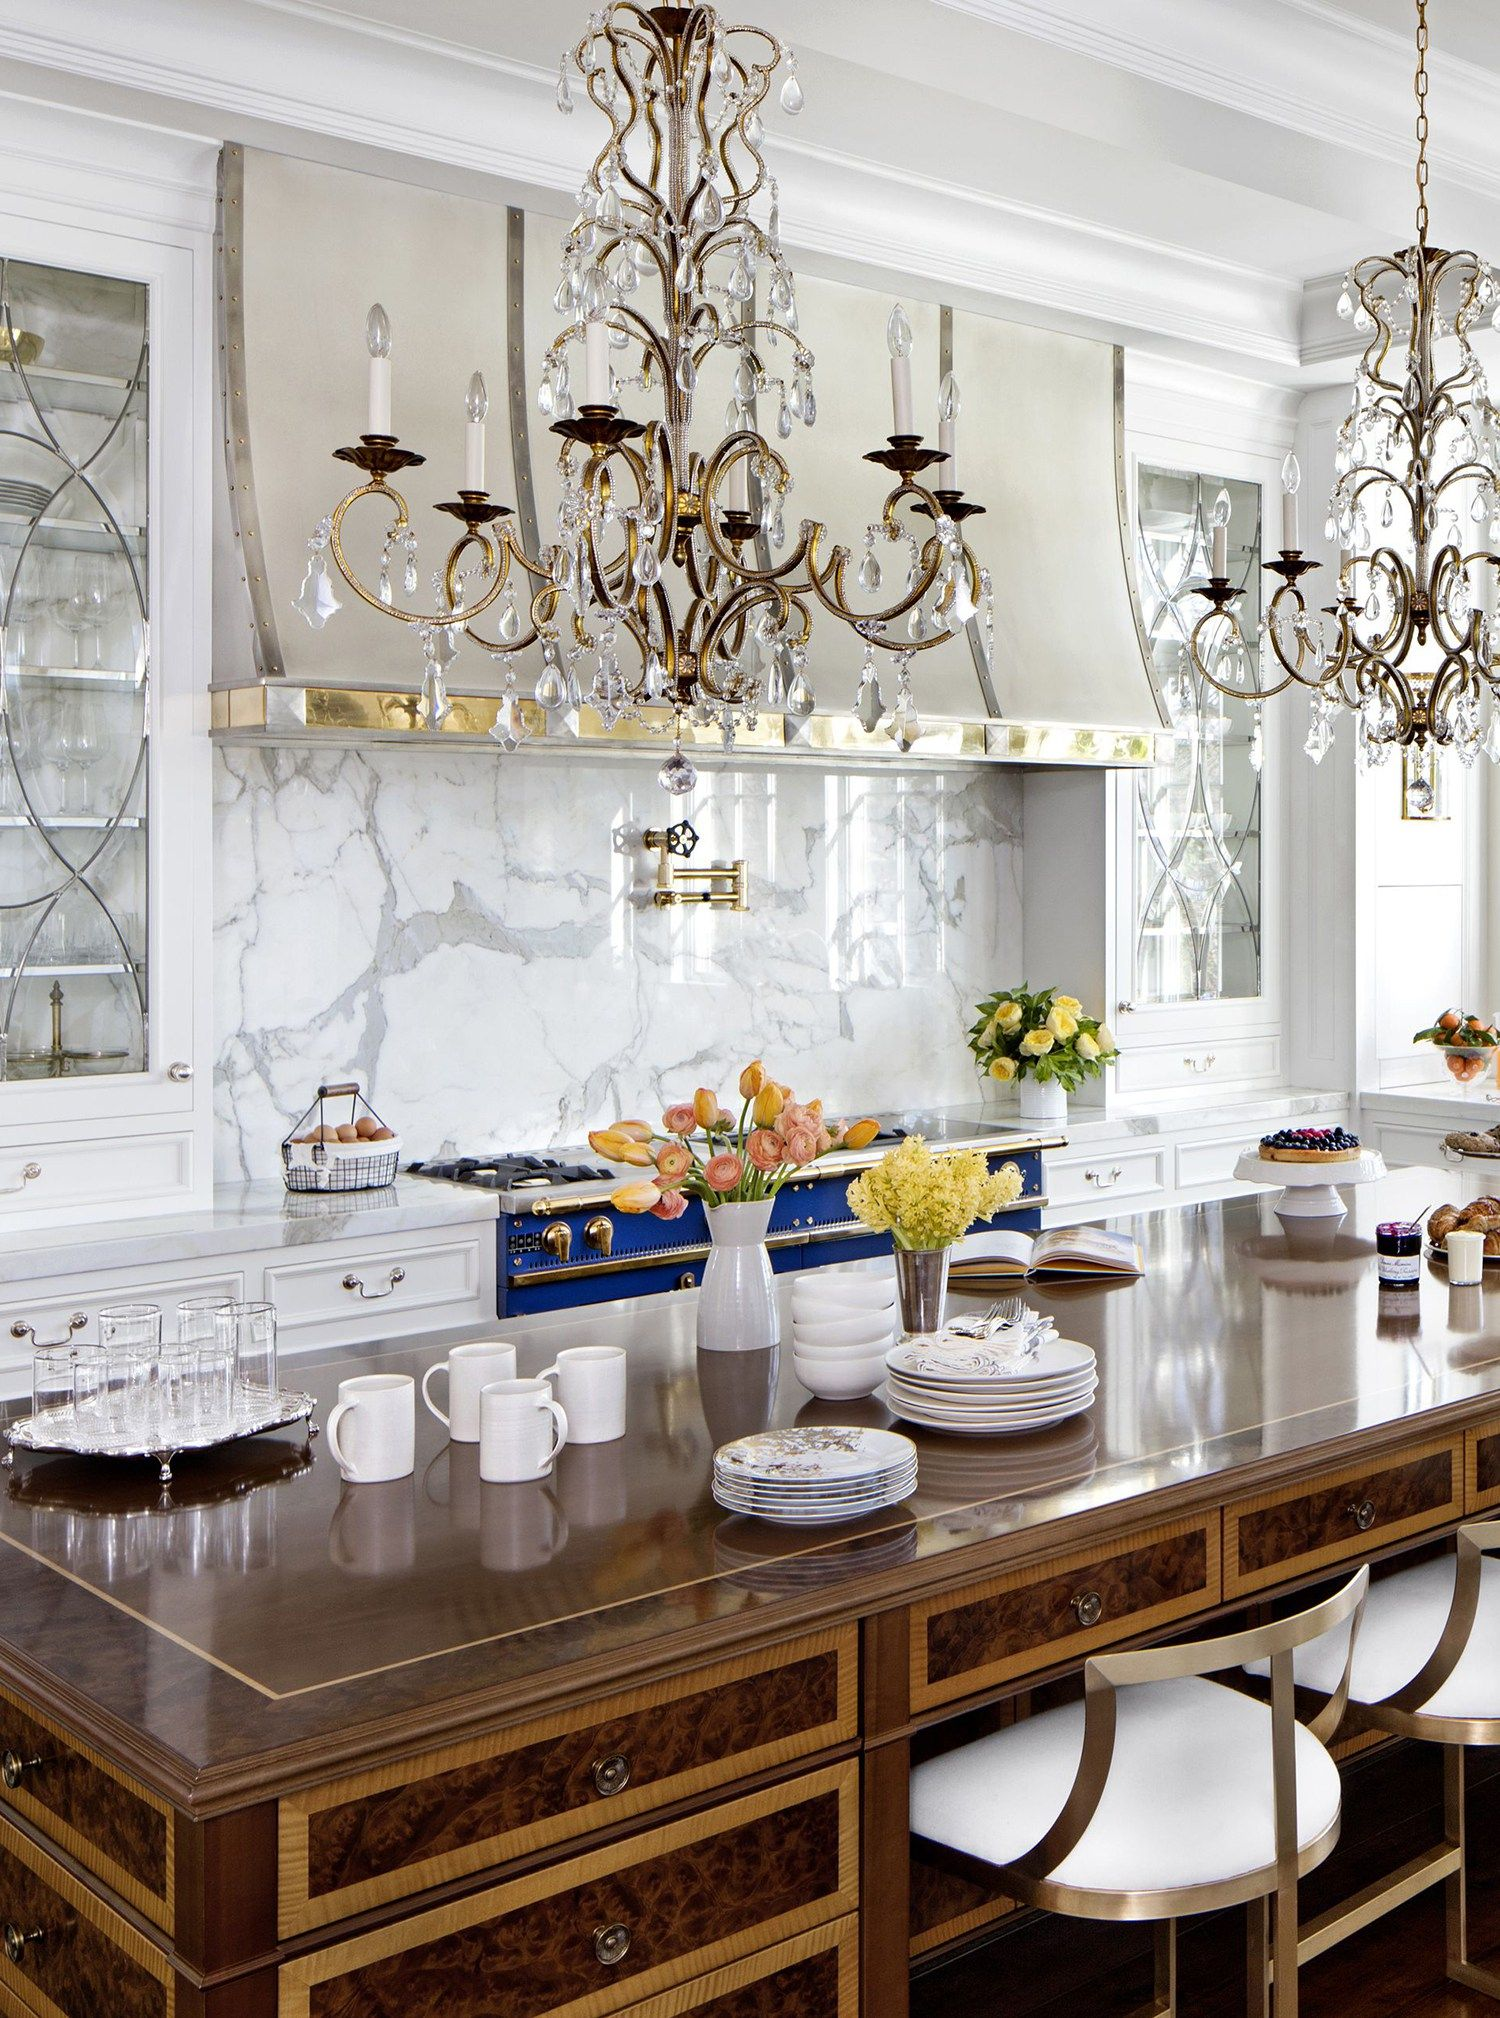 Elegant Kitchen Ideas in 2020 Elegant kitchens, Kitchen